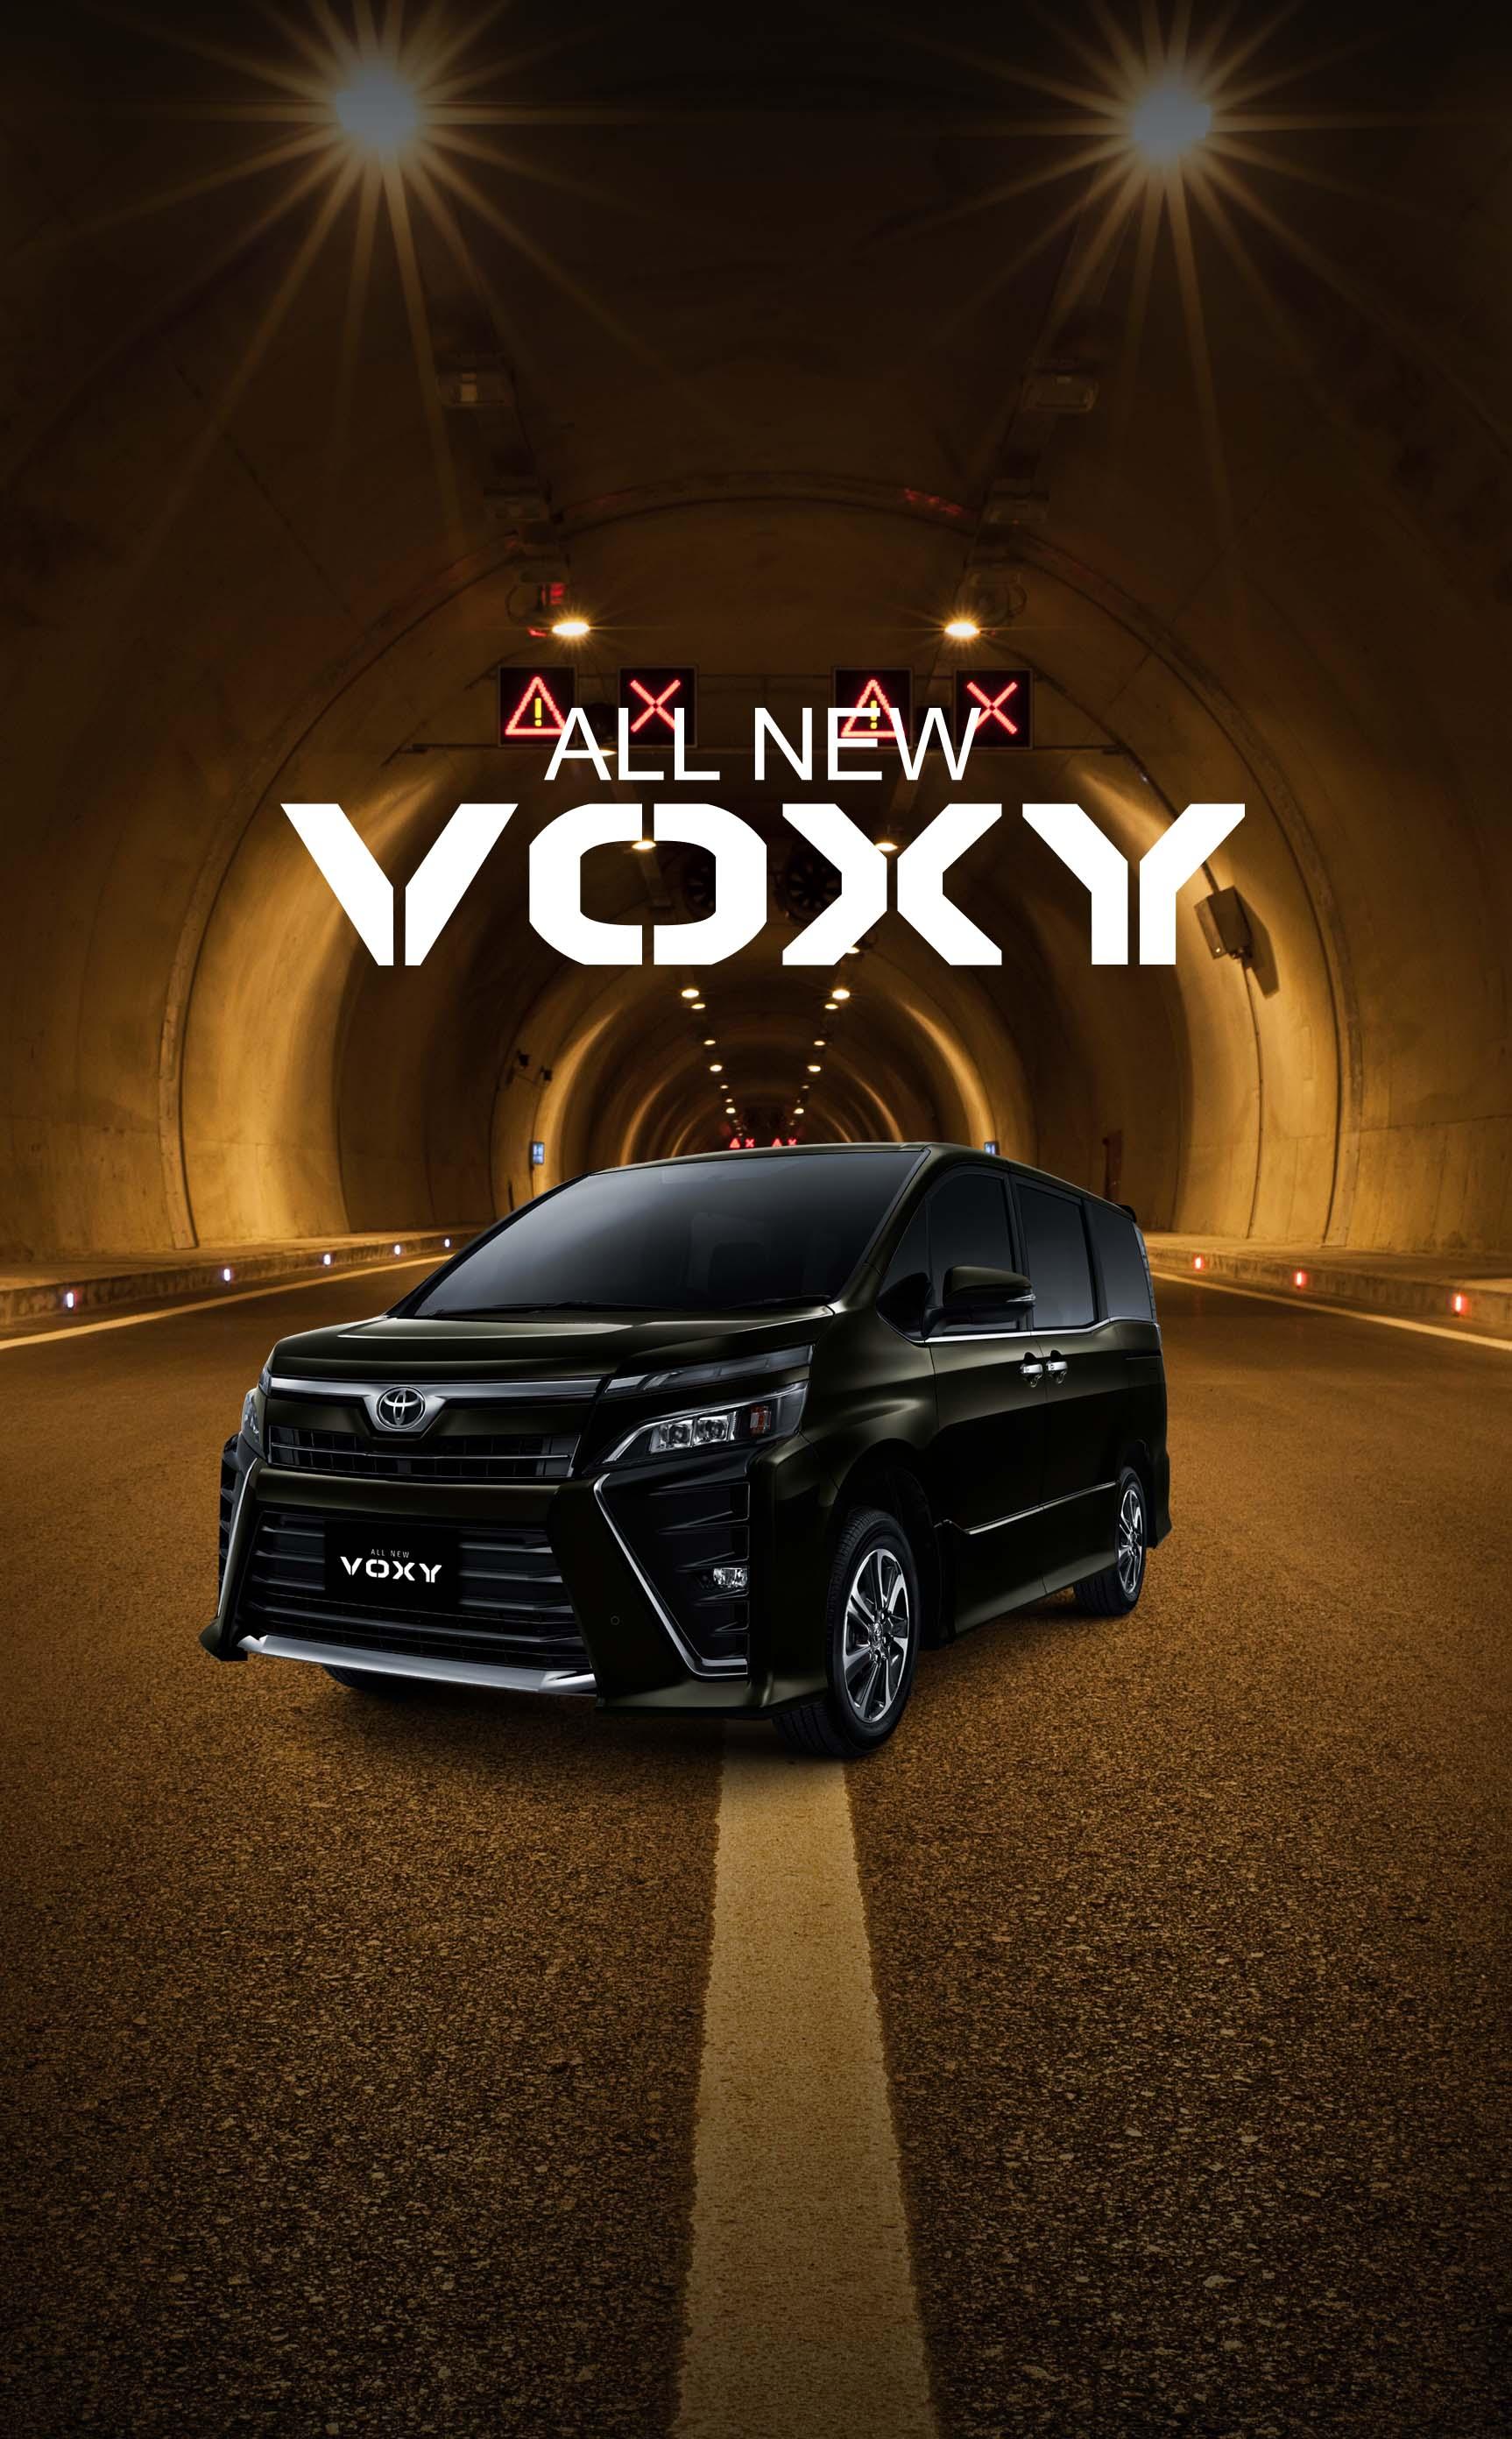 All New Voxy.jpg